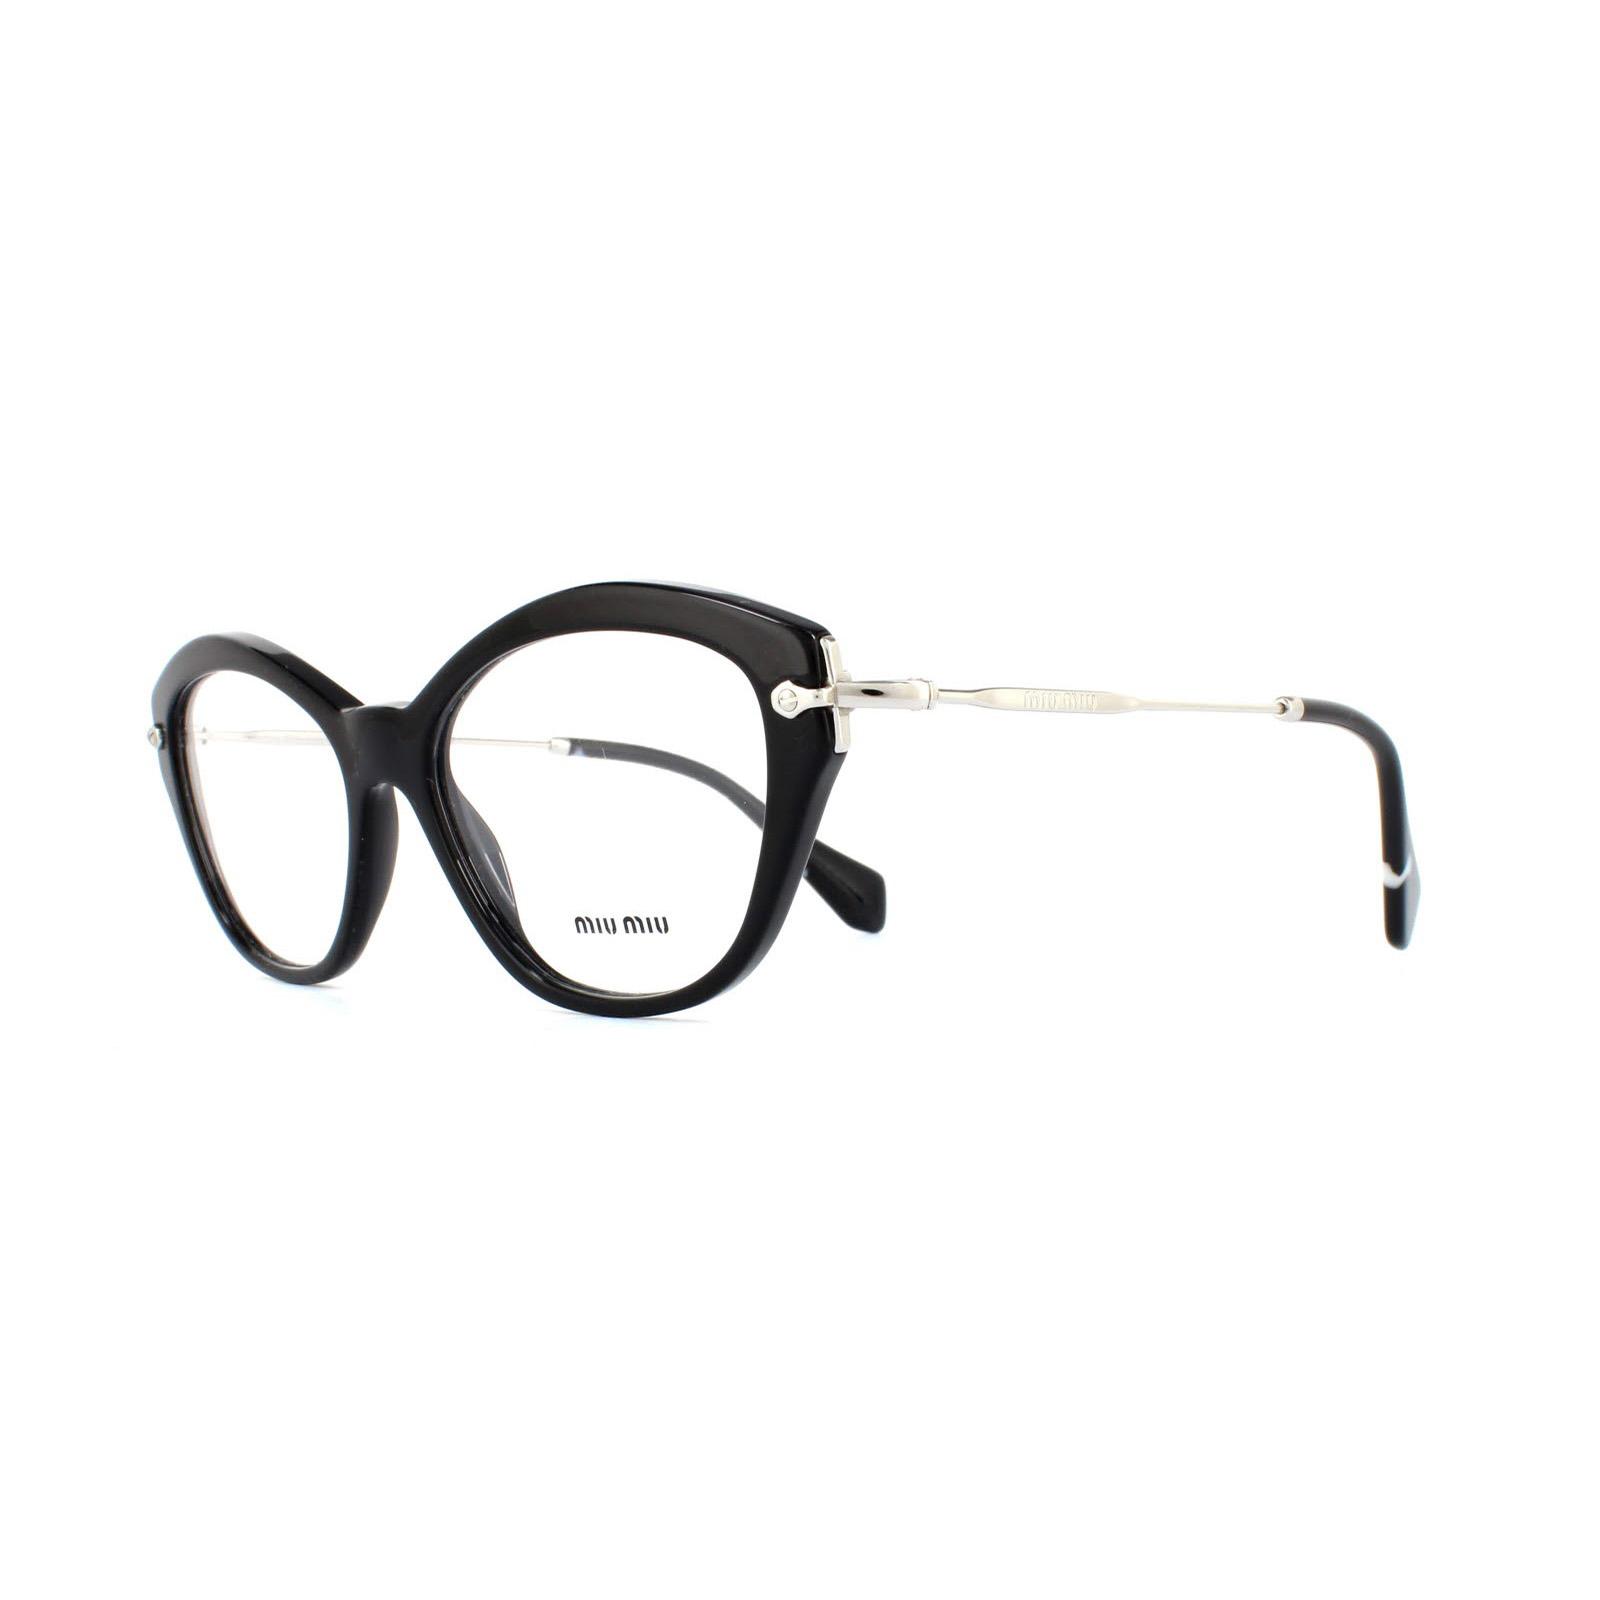 sentinel miu miu glasses frames 02ov 1ab1o1 black womens 54mm - Miu Miu Glasses Frames